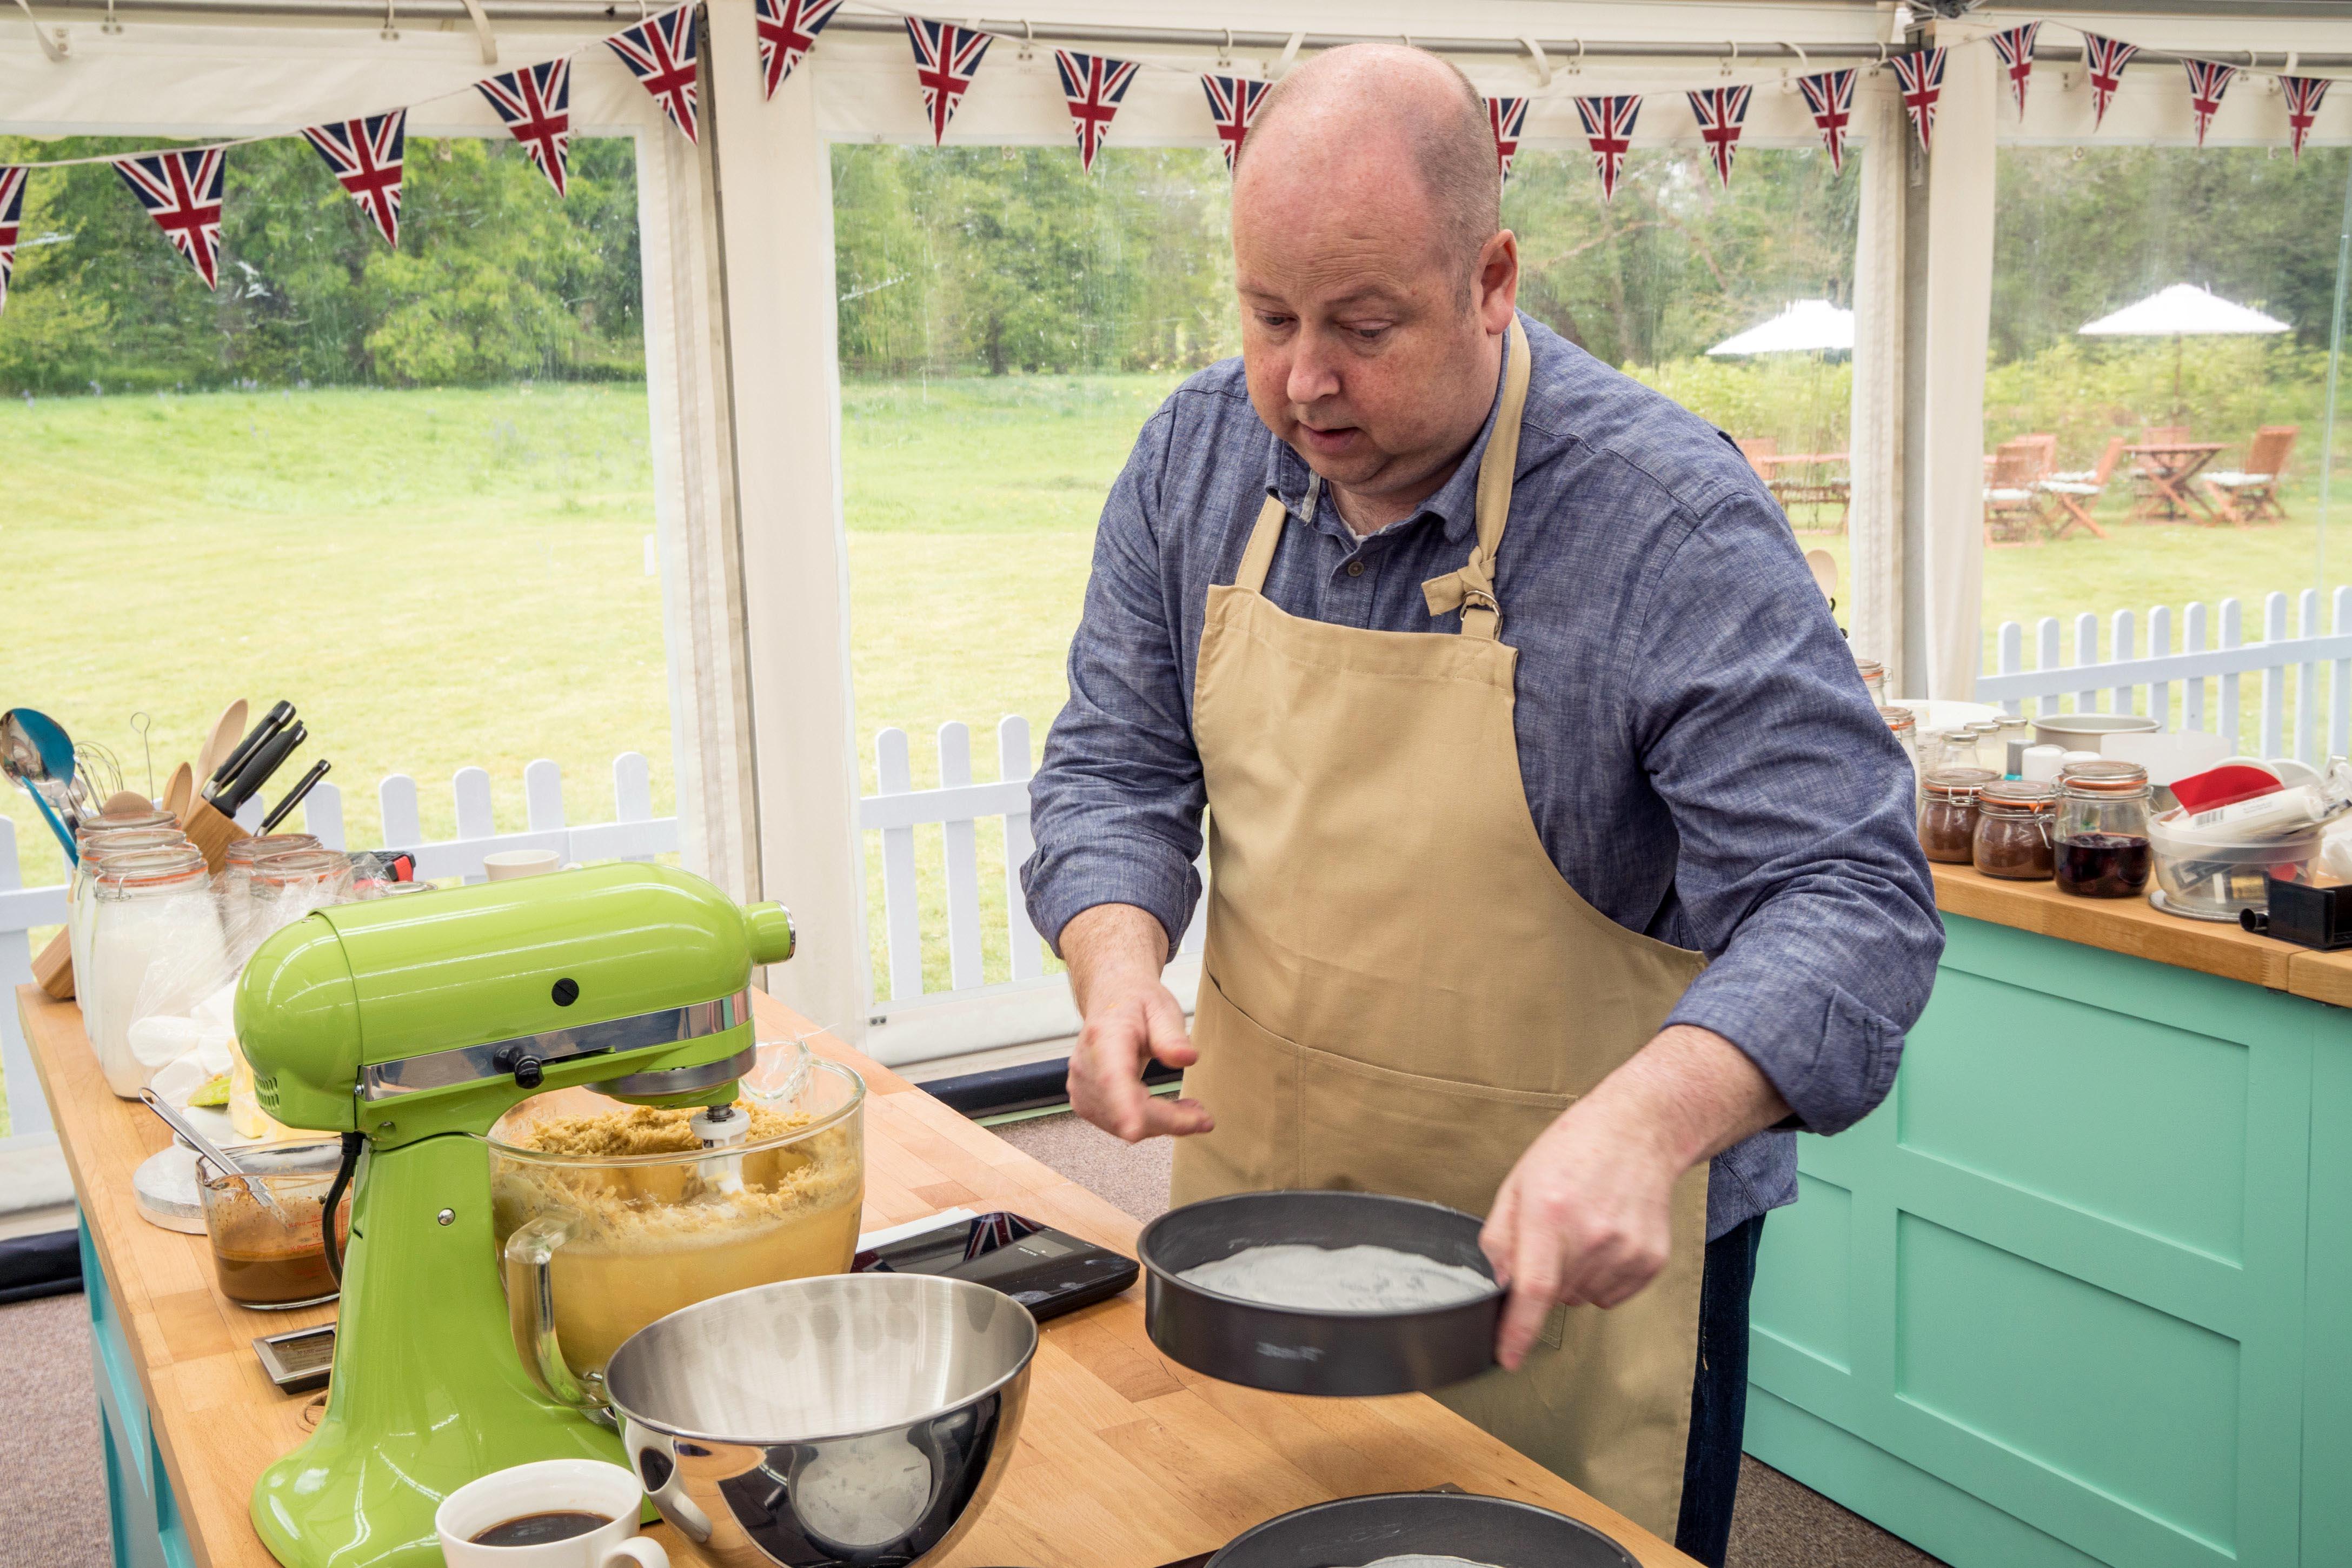 Great British Bake Off contestant James